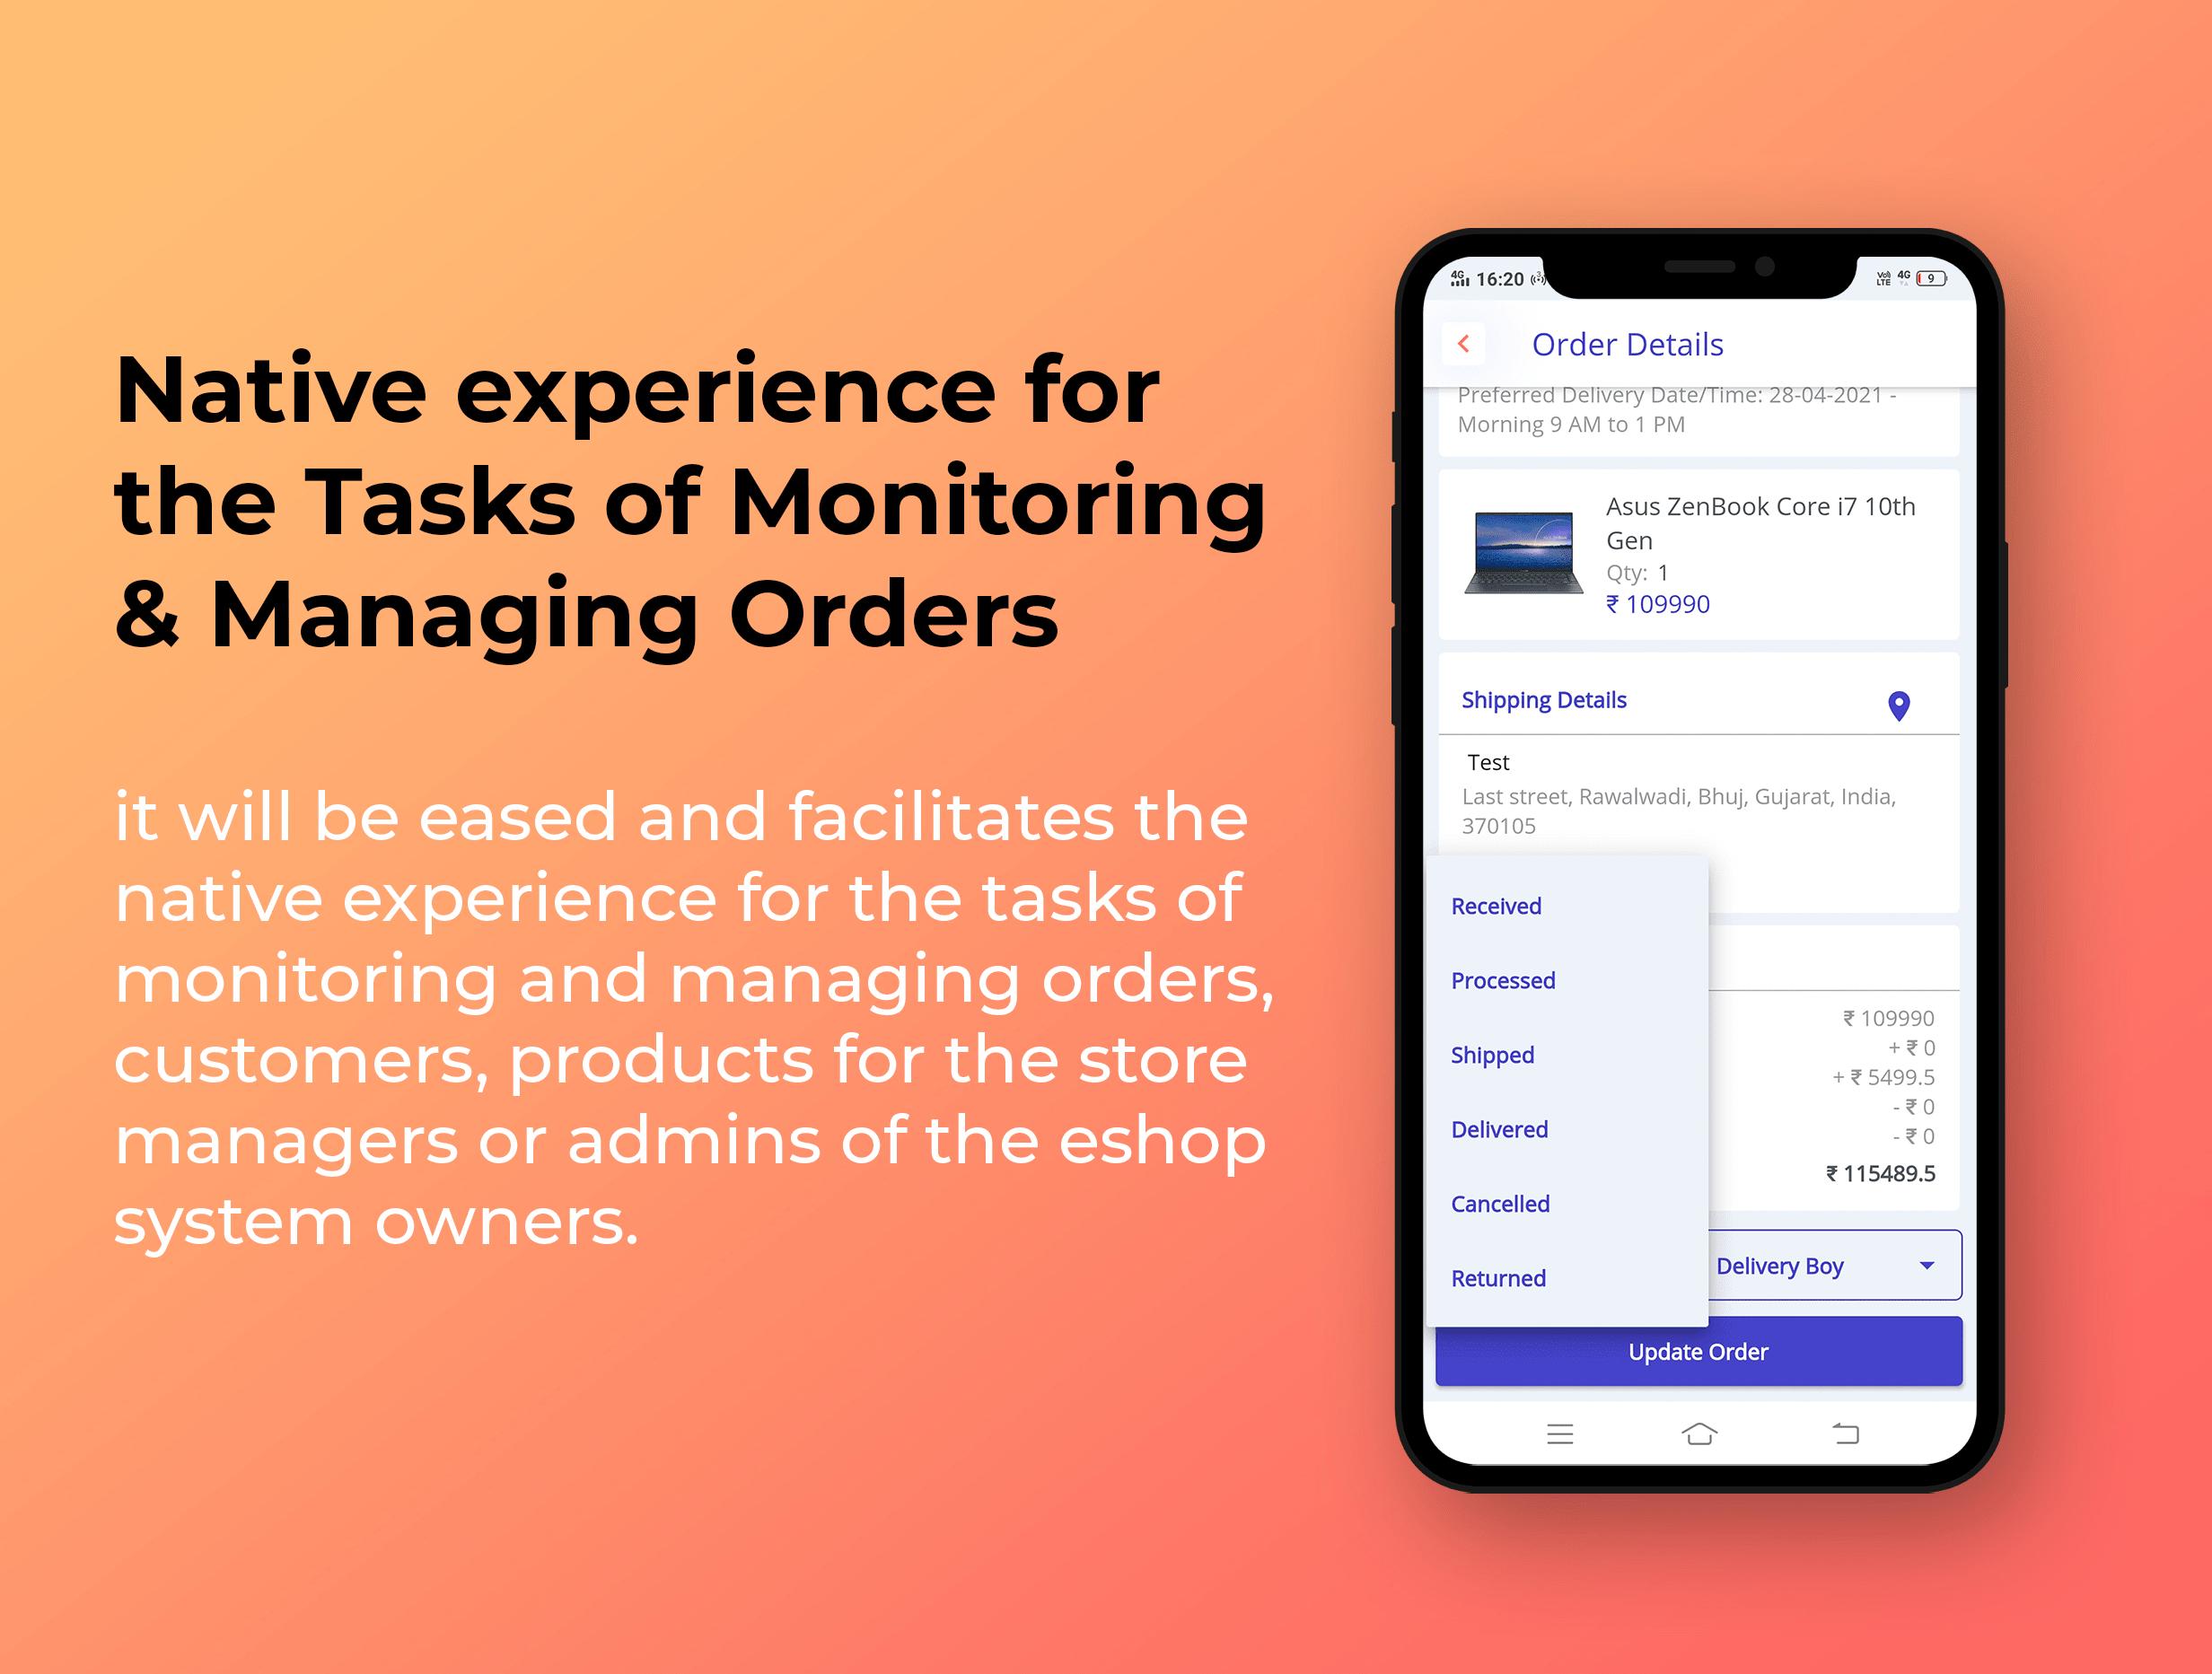 eShop - Ecommerce Admin / Store Manager app - 6